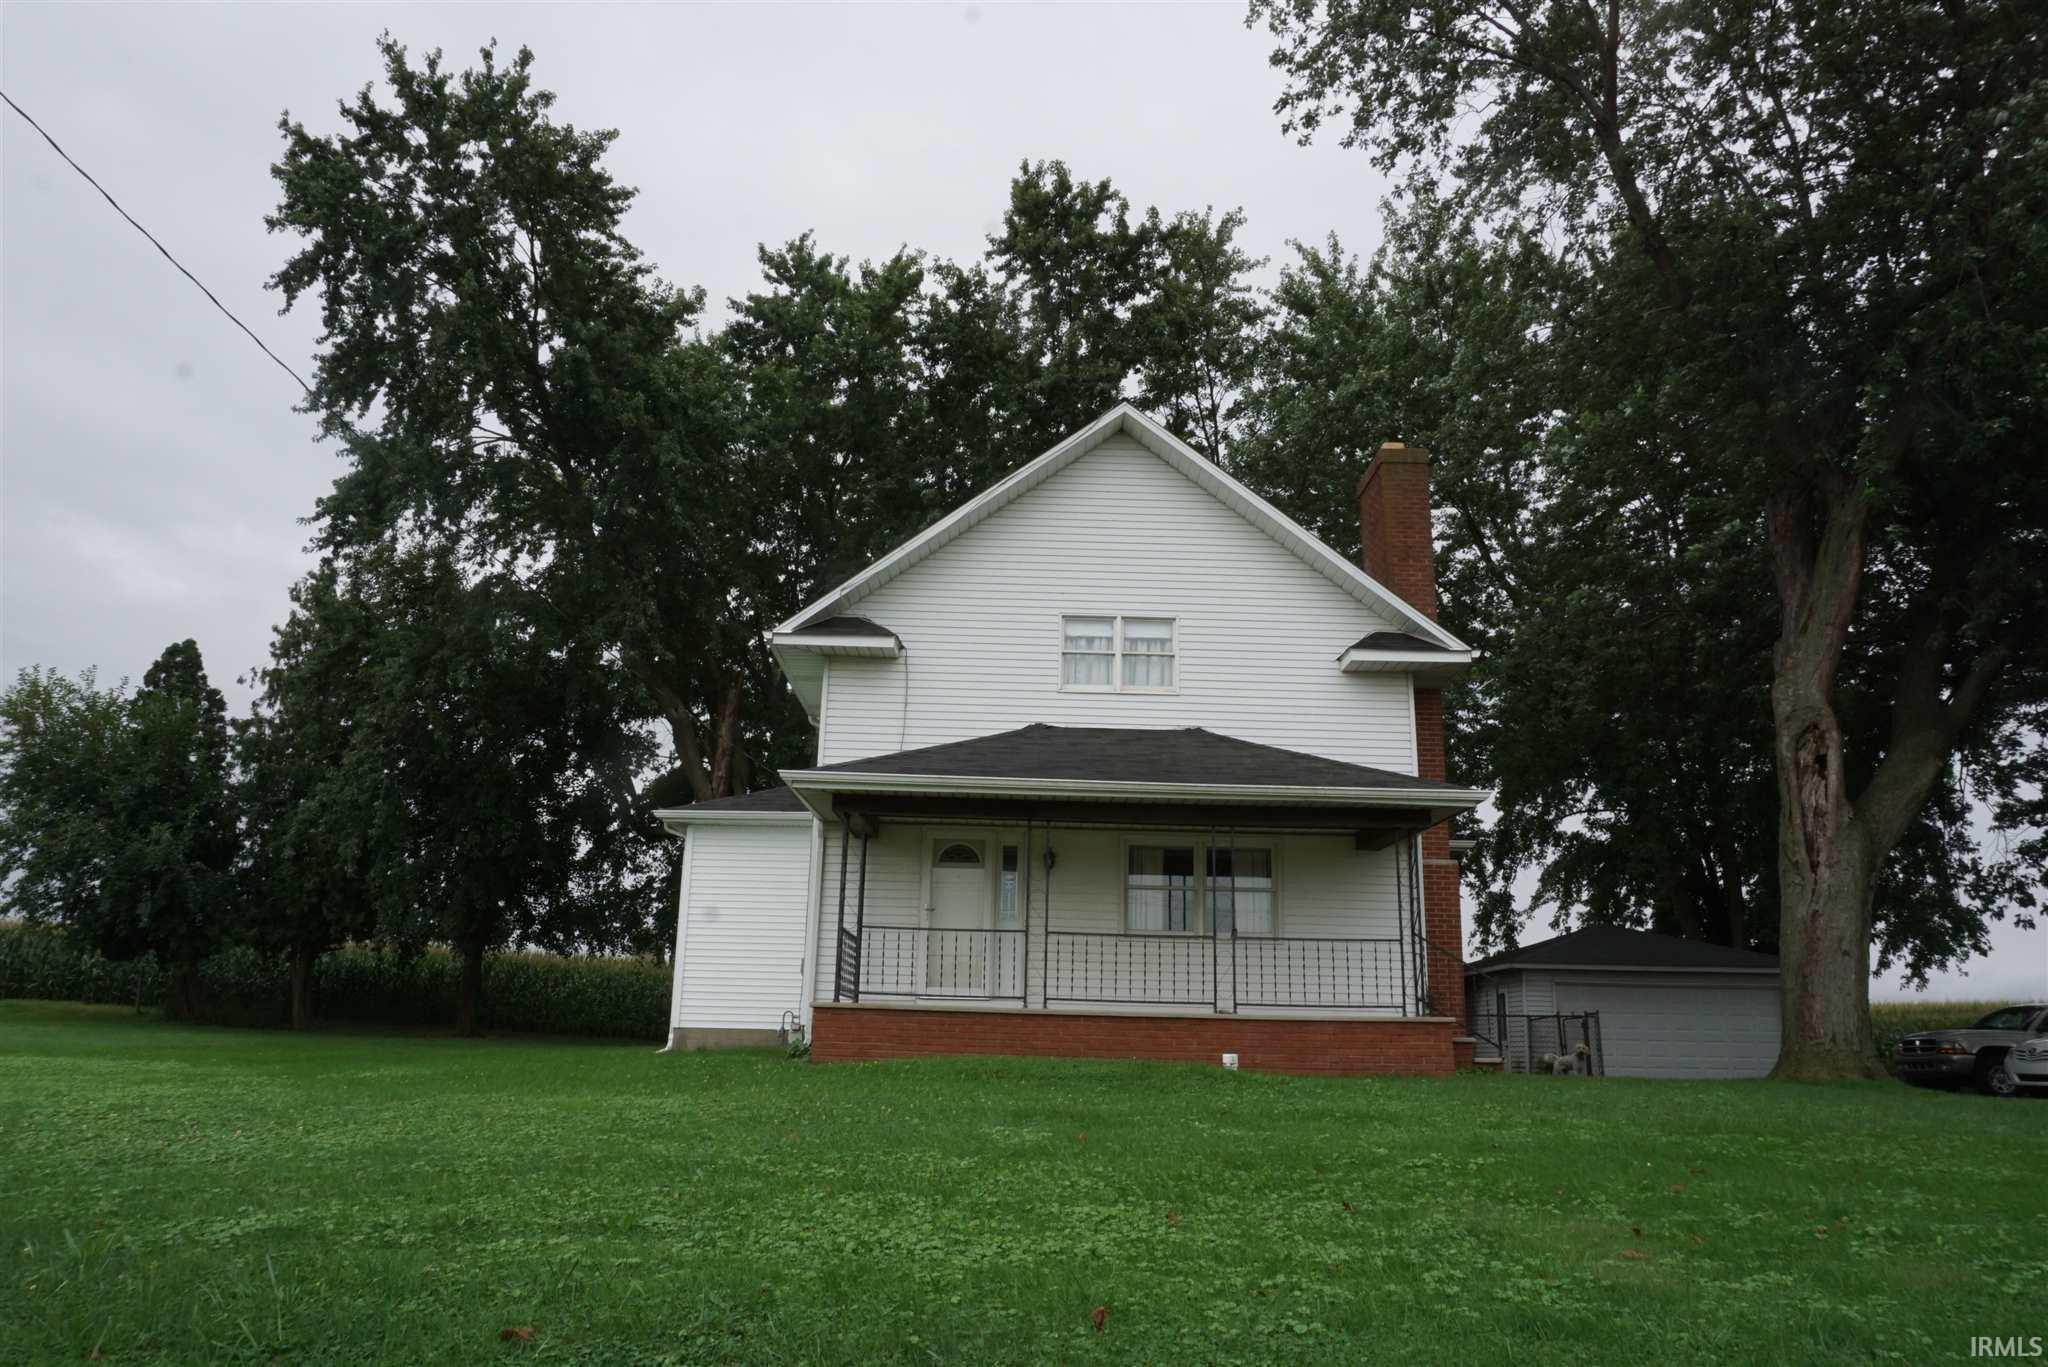 27116 County Road 26 Elkhart, IN 46517